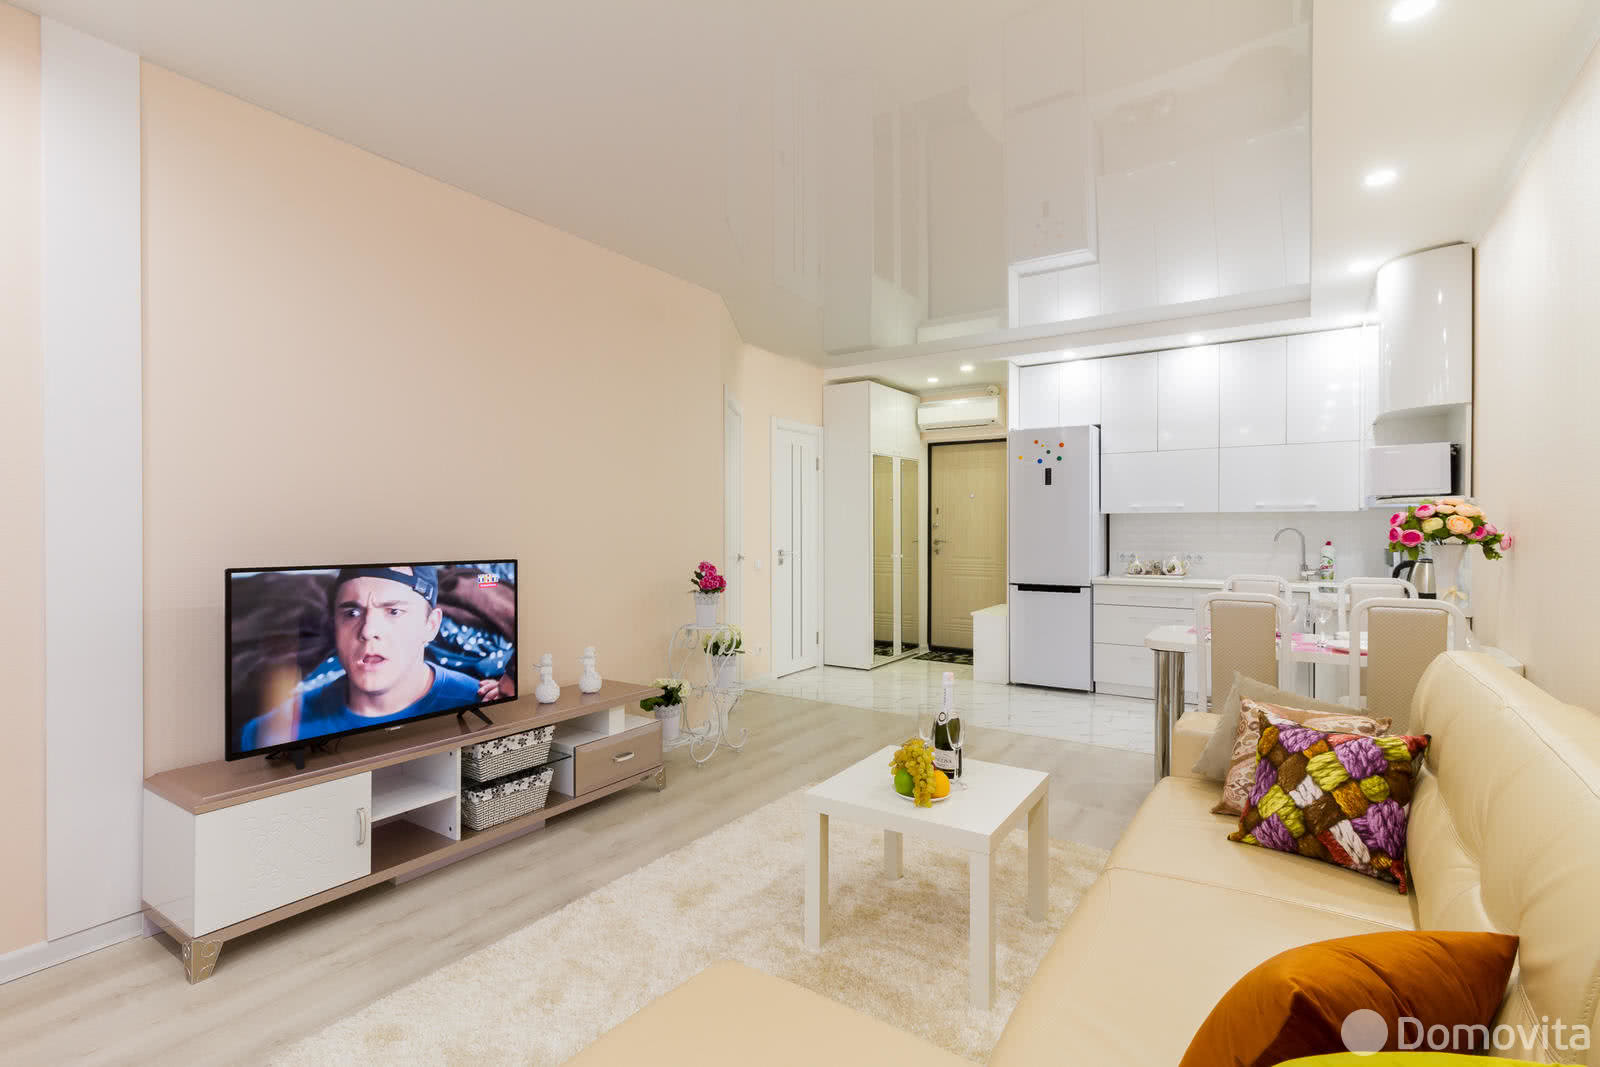 Аренда 2-комнатной квартиры на сутки в Минске, ул. Репина, д. 4 - фото 5